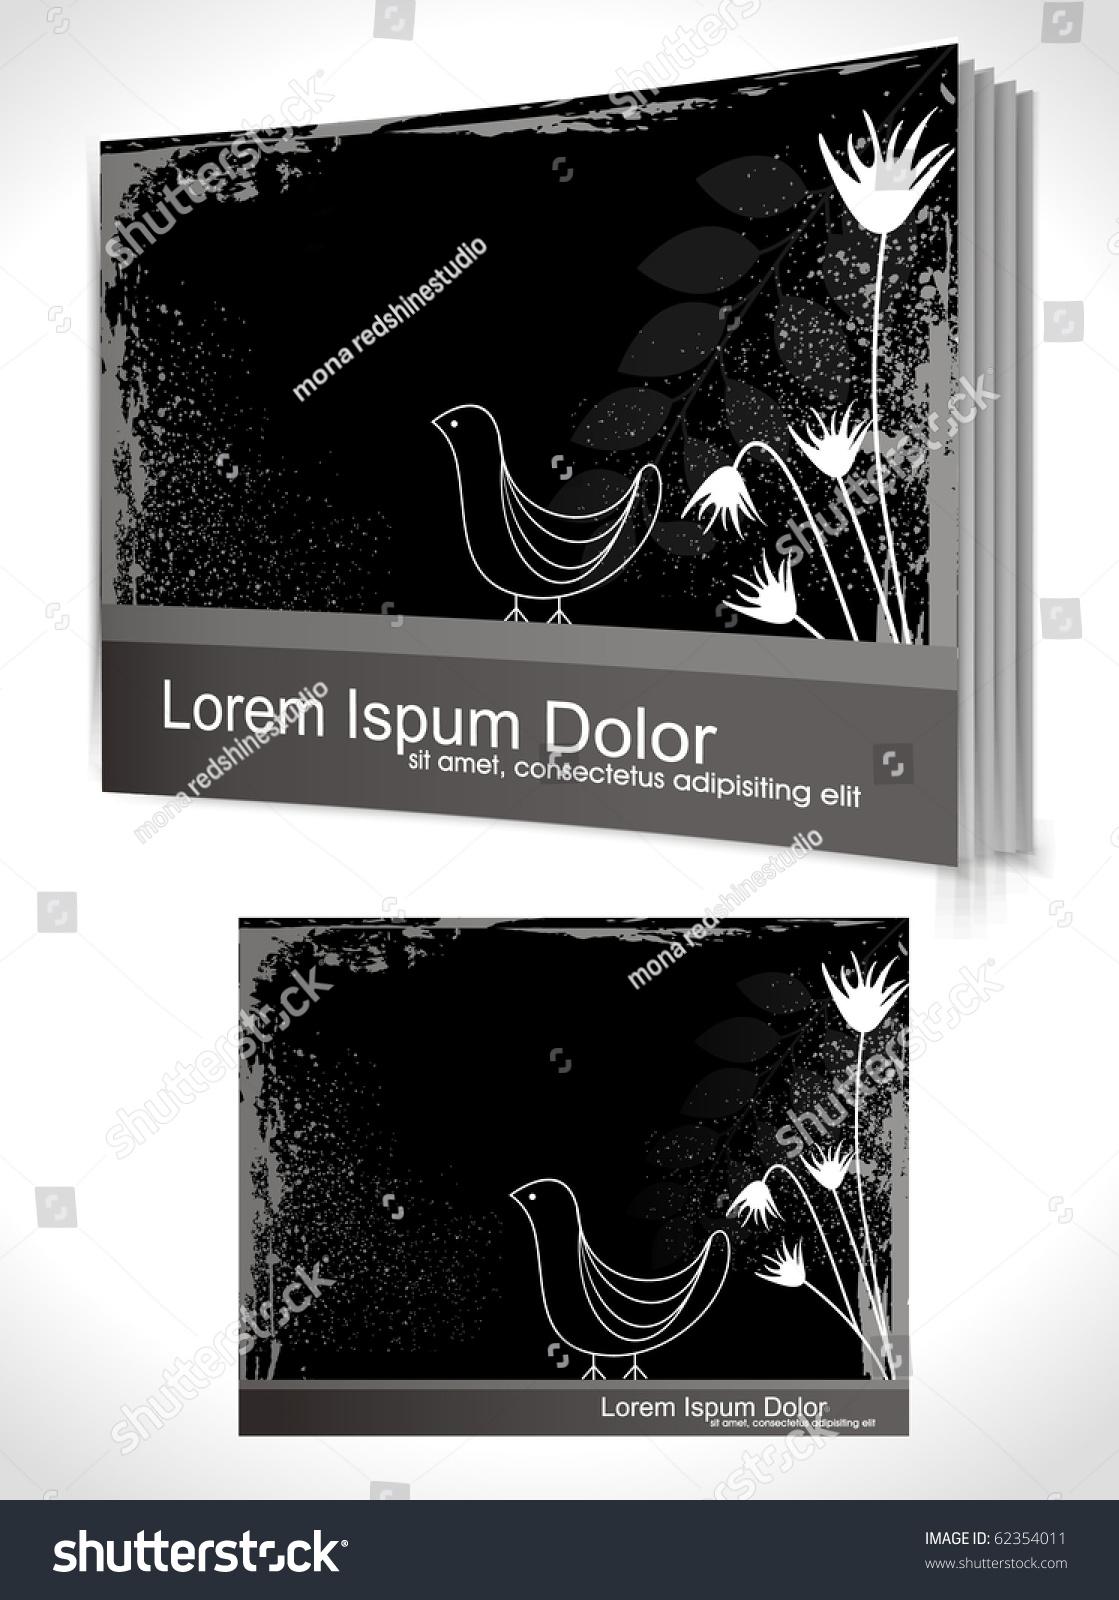 Book Cover Design Vector Template : Book cover design template vector illustration